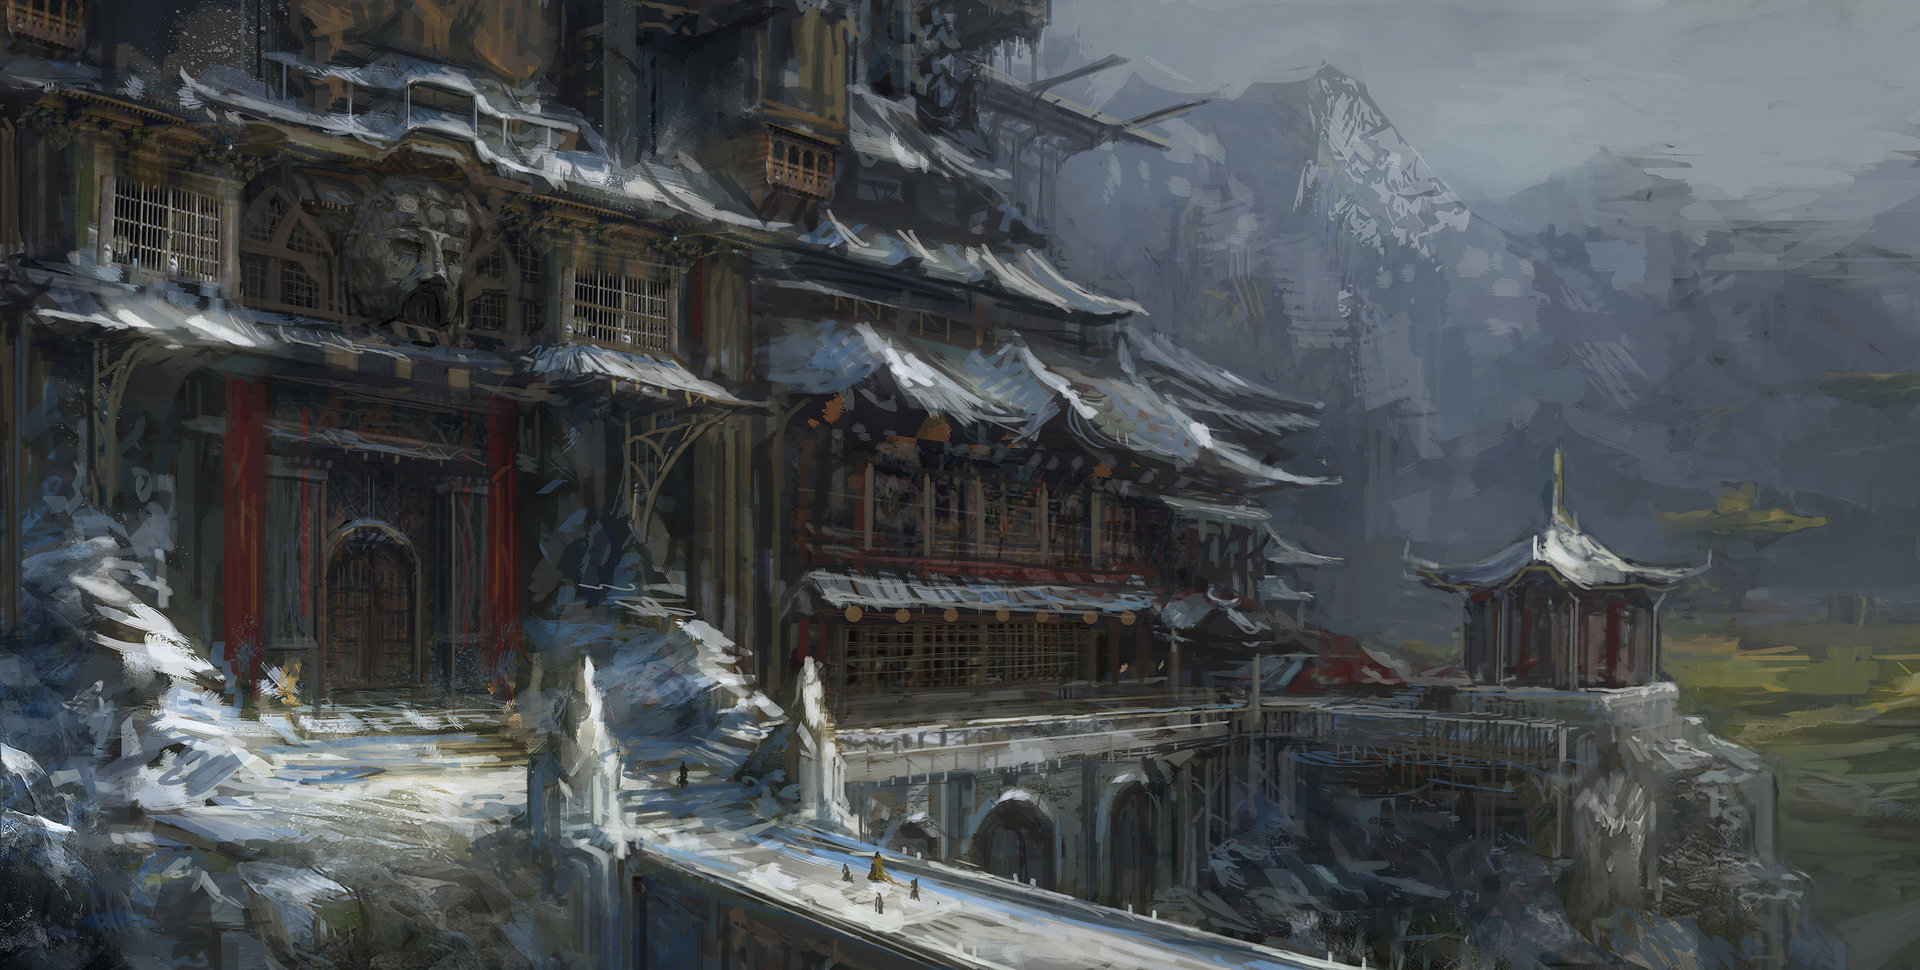 Muyoung kim mountain monastery